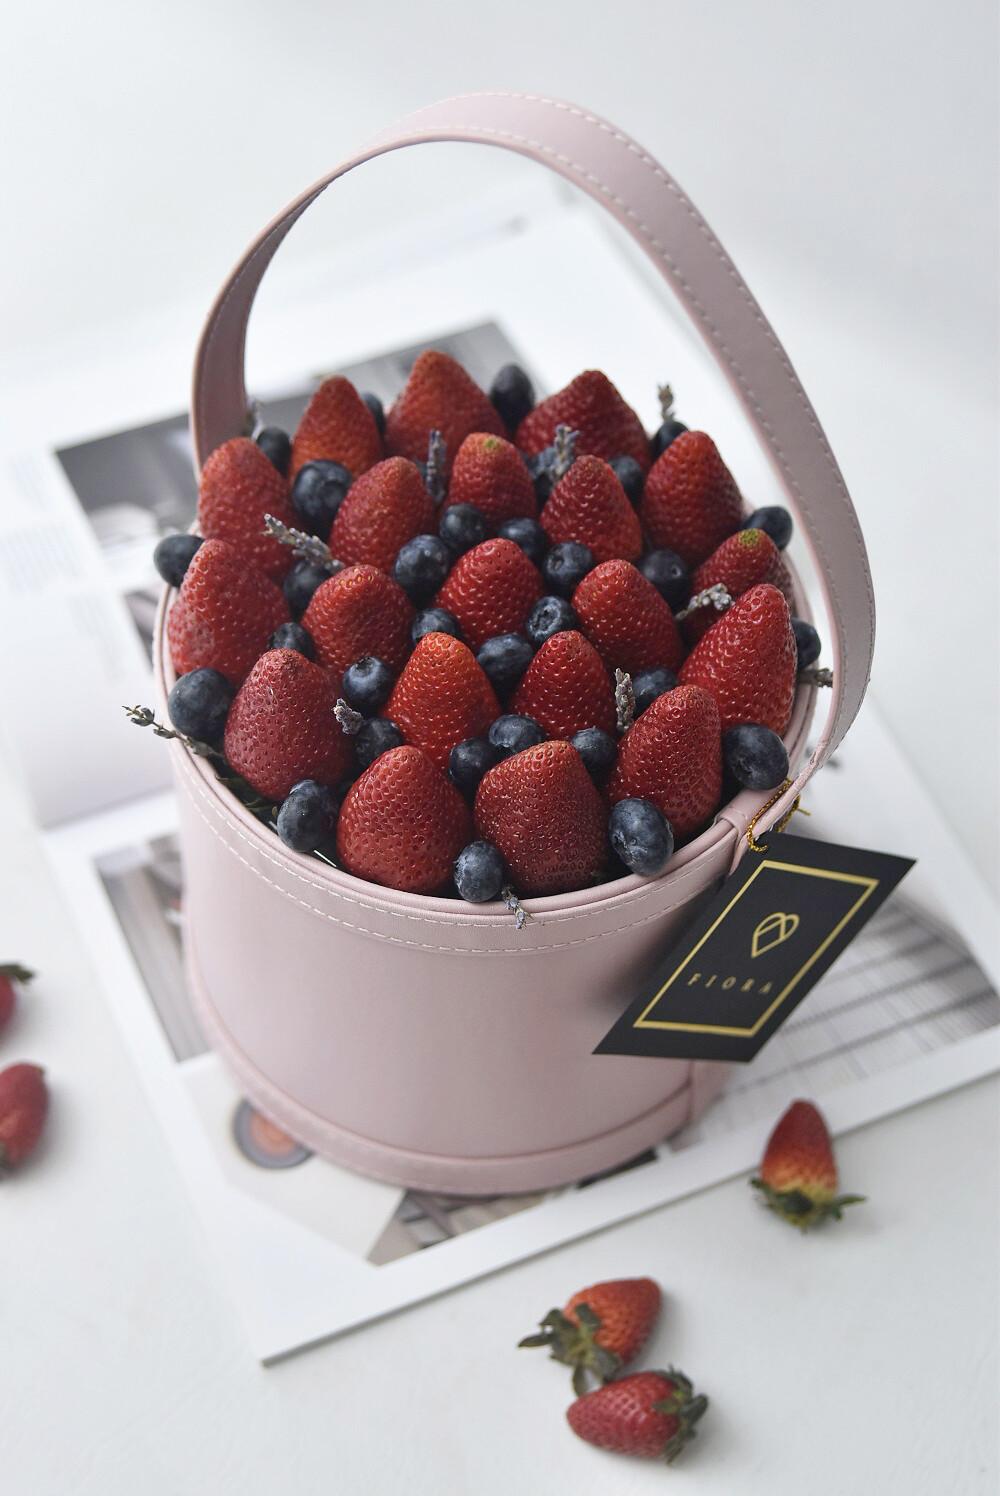 Berry Merry Medley